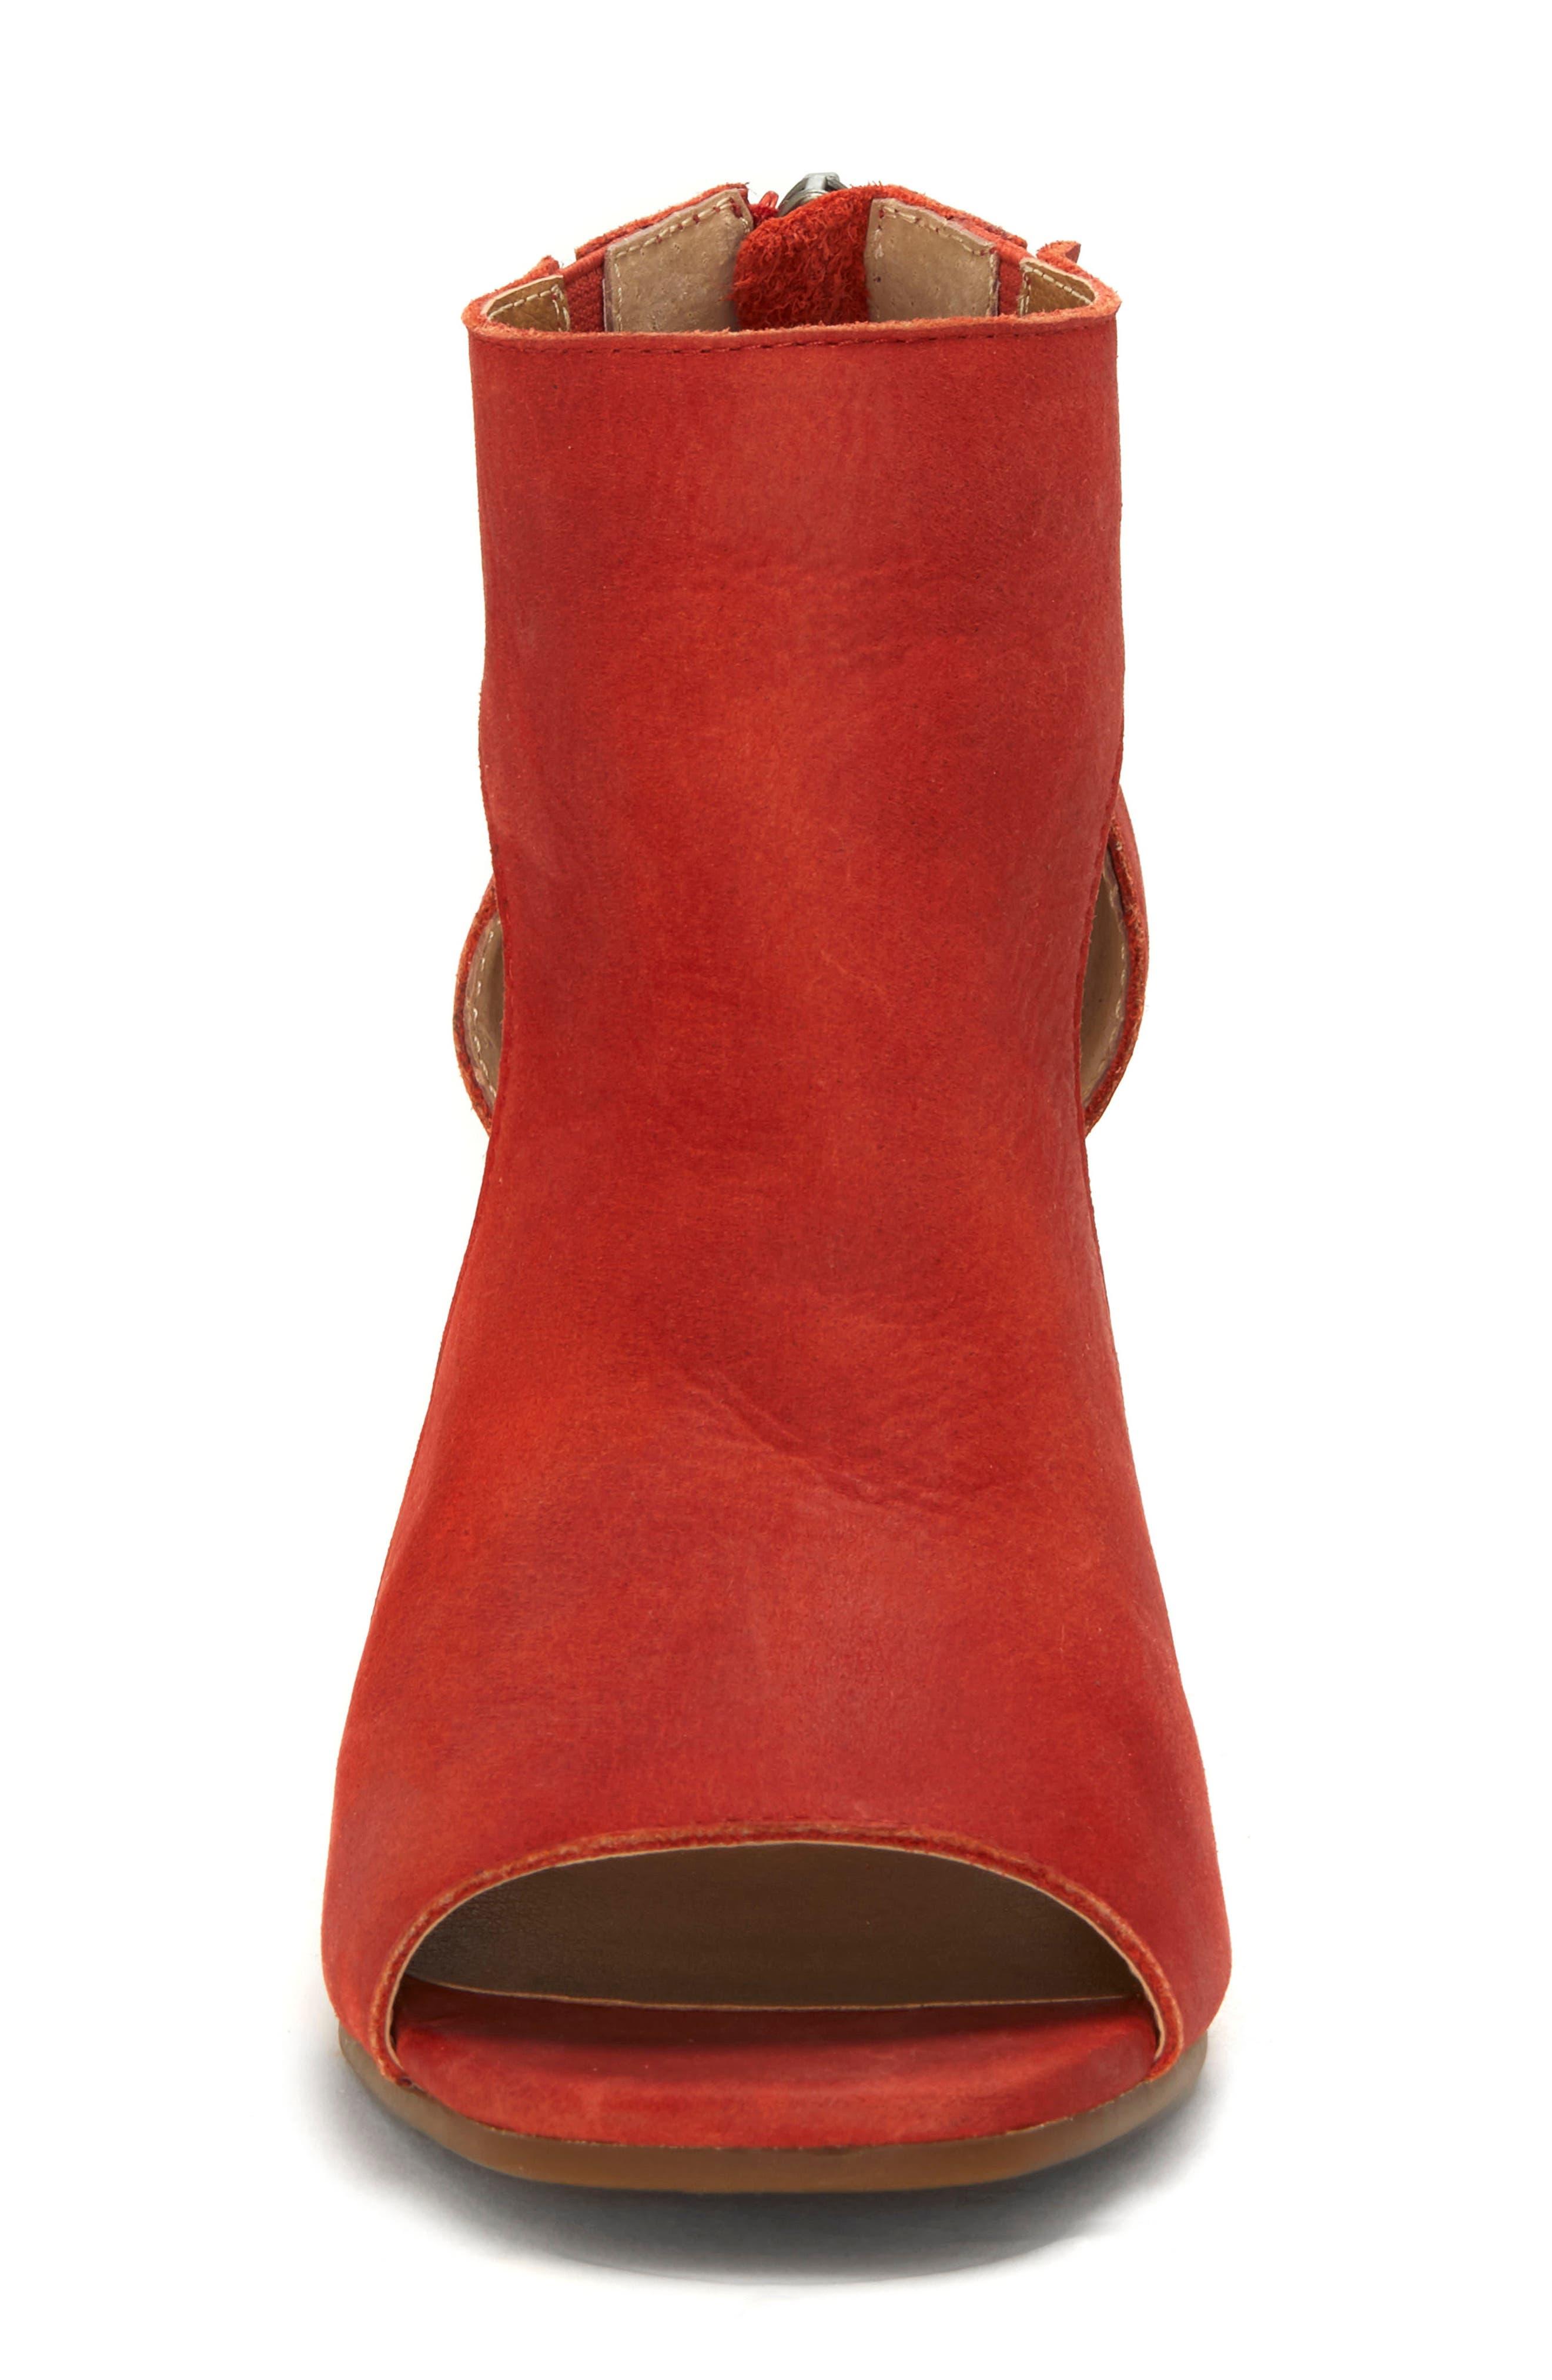 Udine Shield Sandal,                             Alternate thumbnail 4, color,                             TANDORI LEATHER